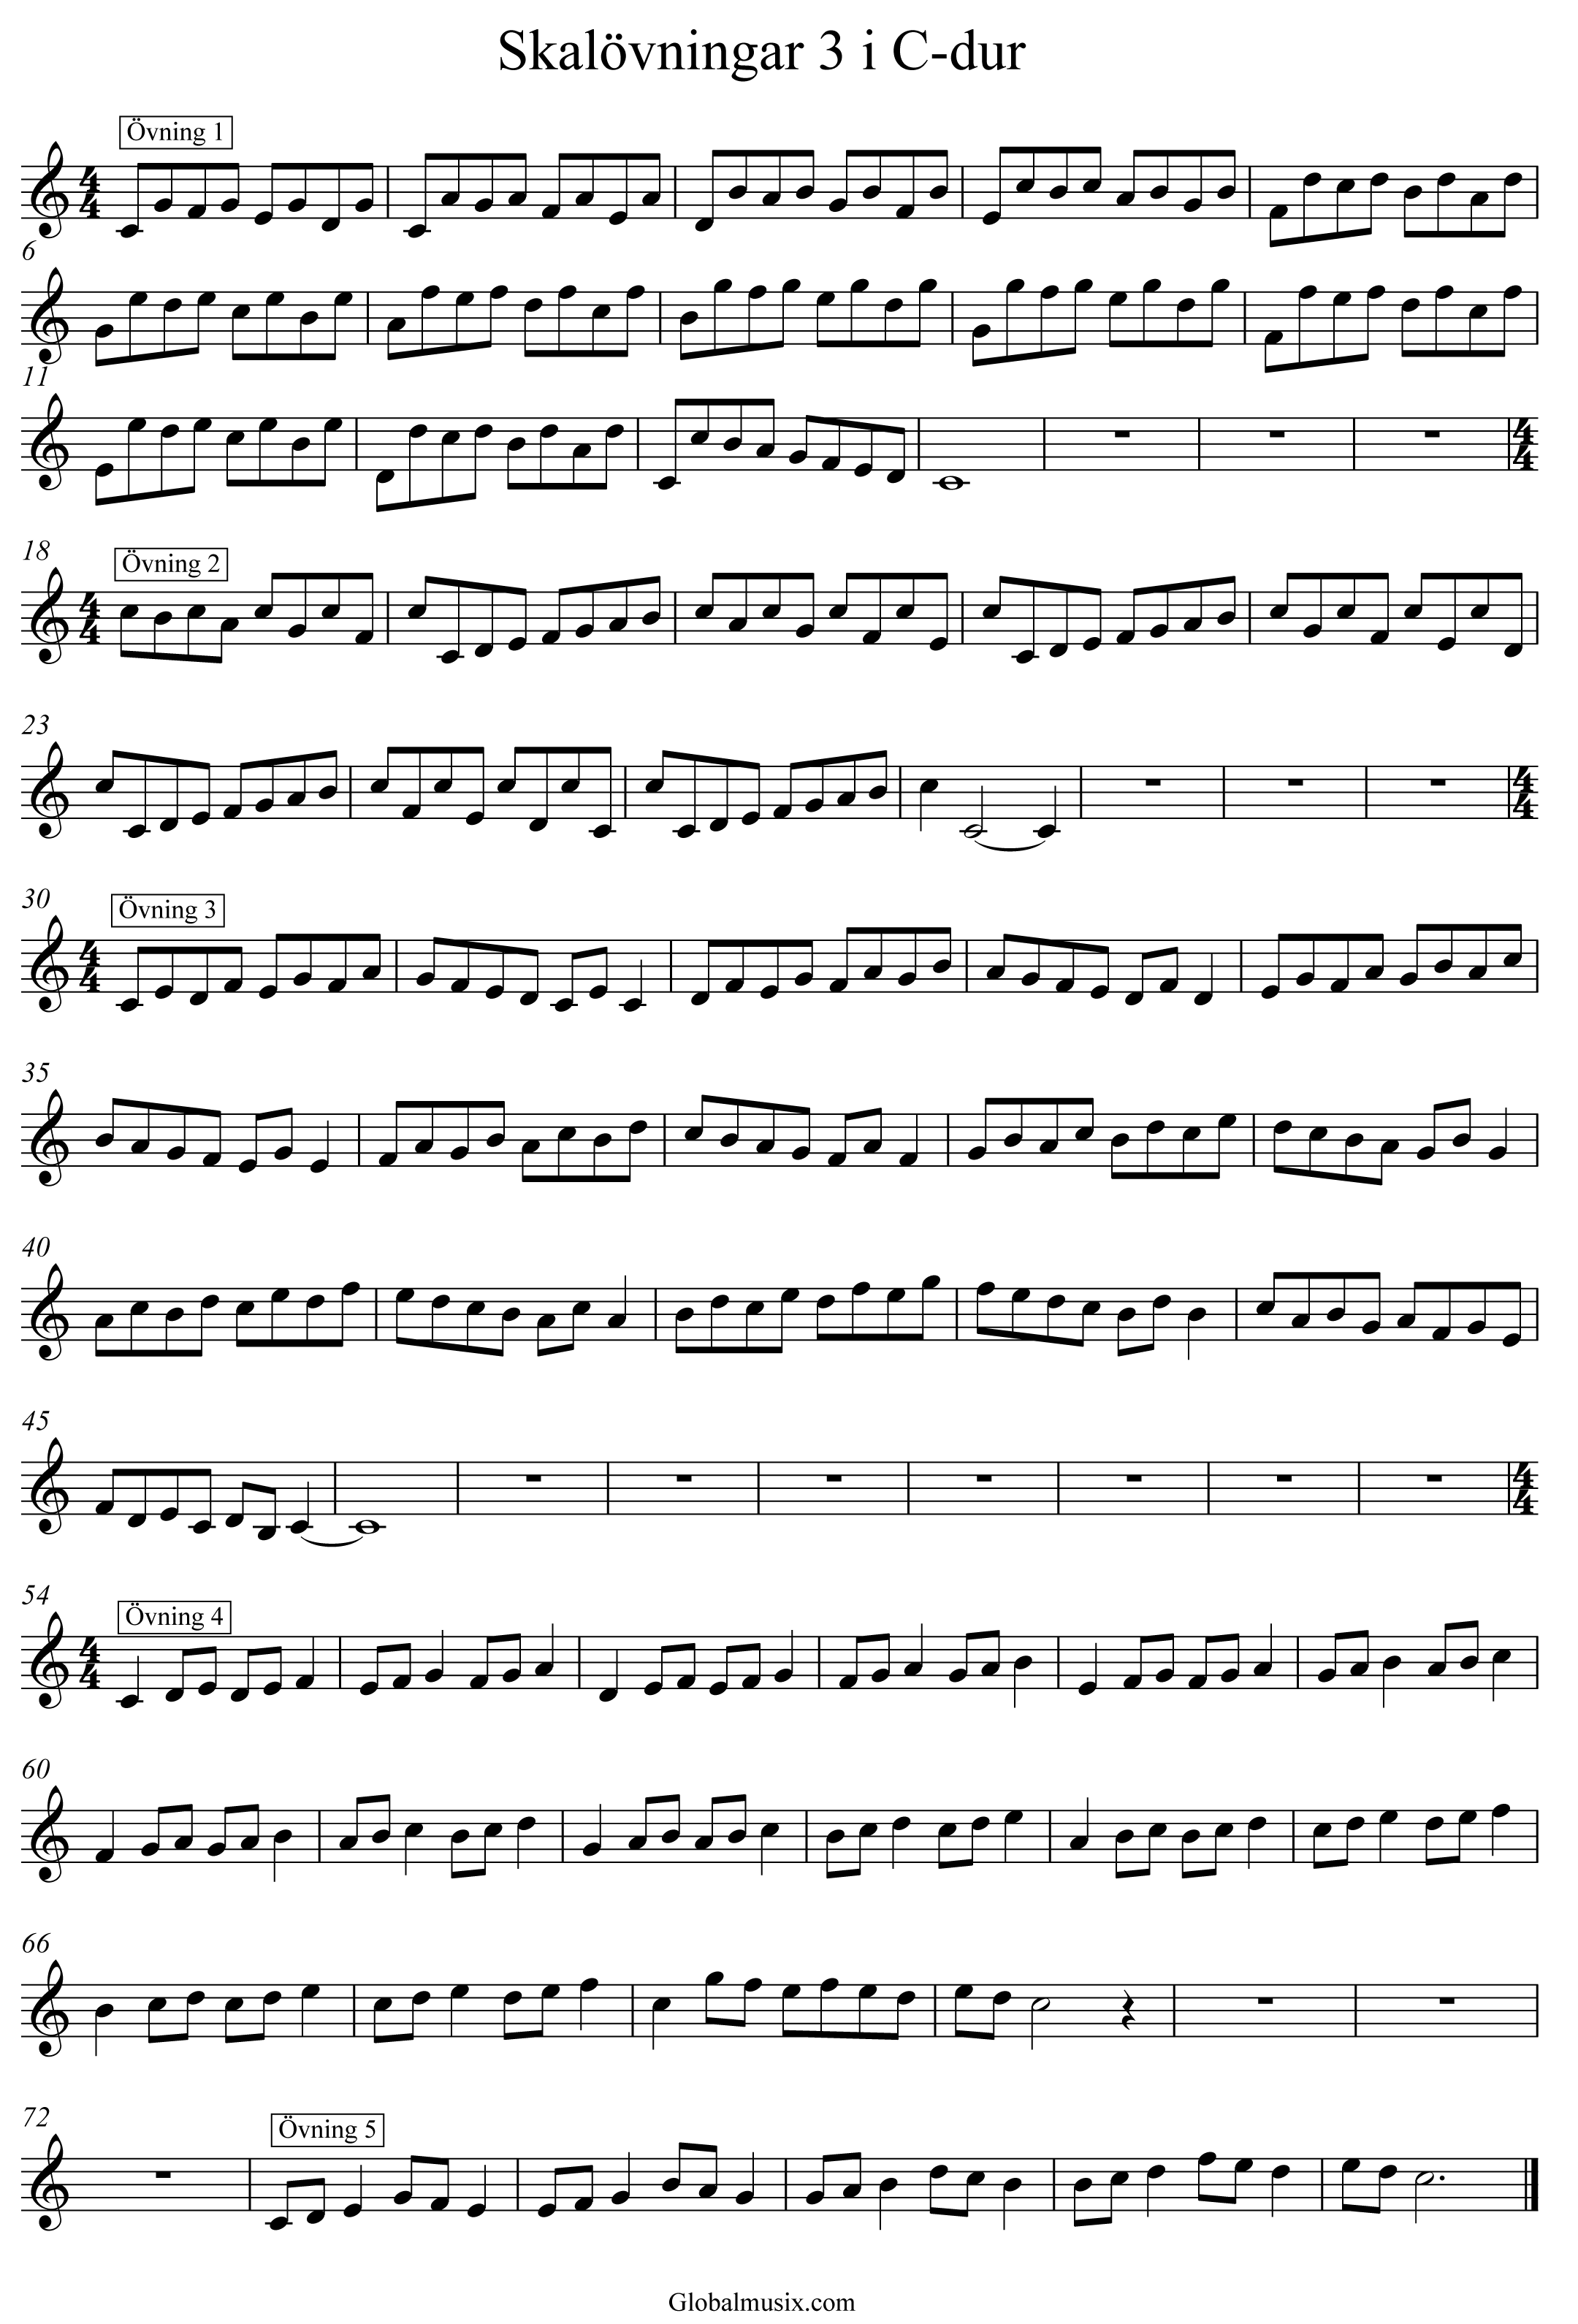 Enkla skalövningar 2 i C-dur